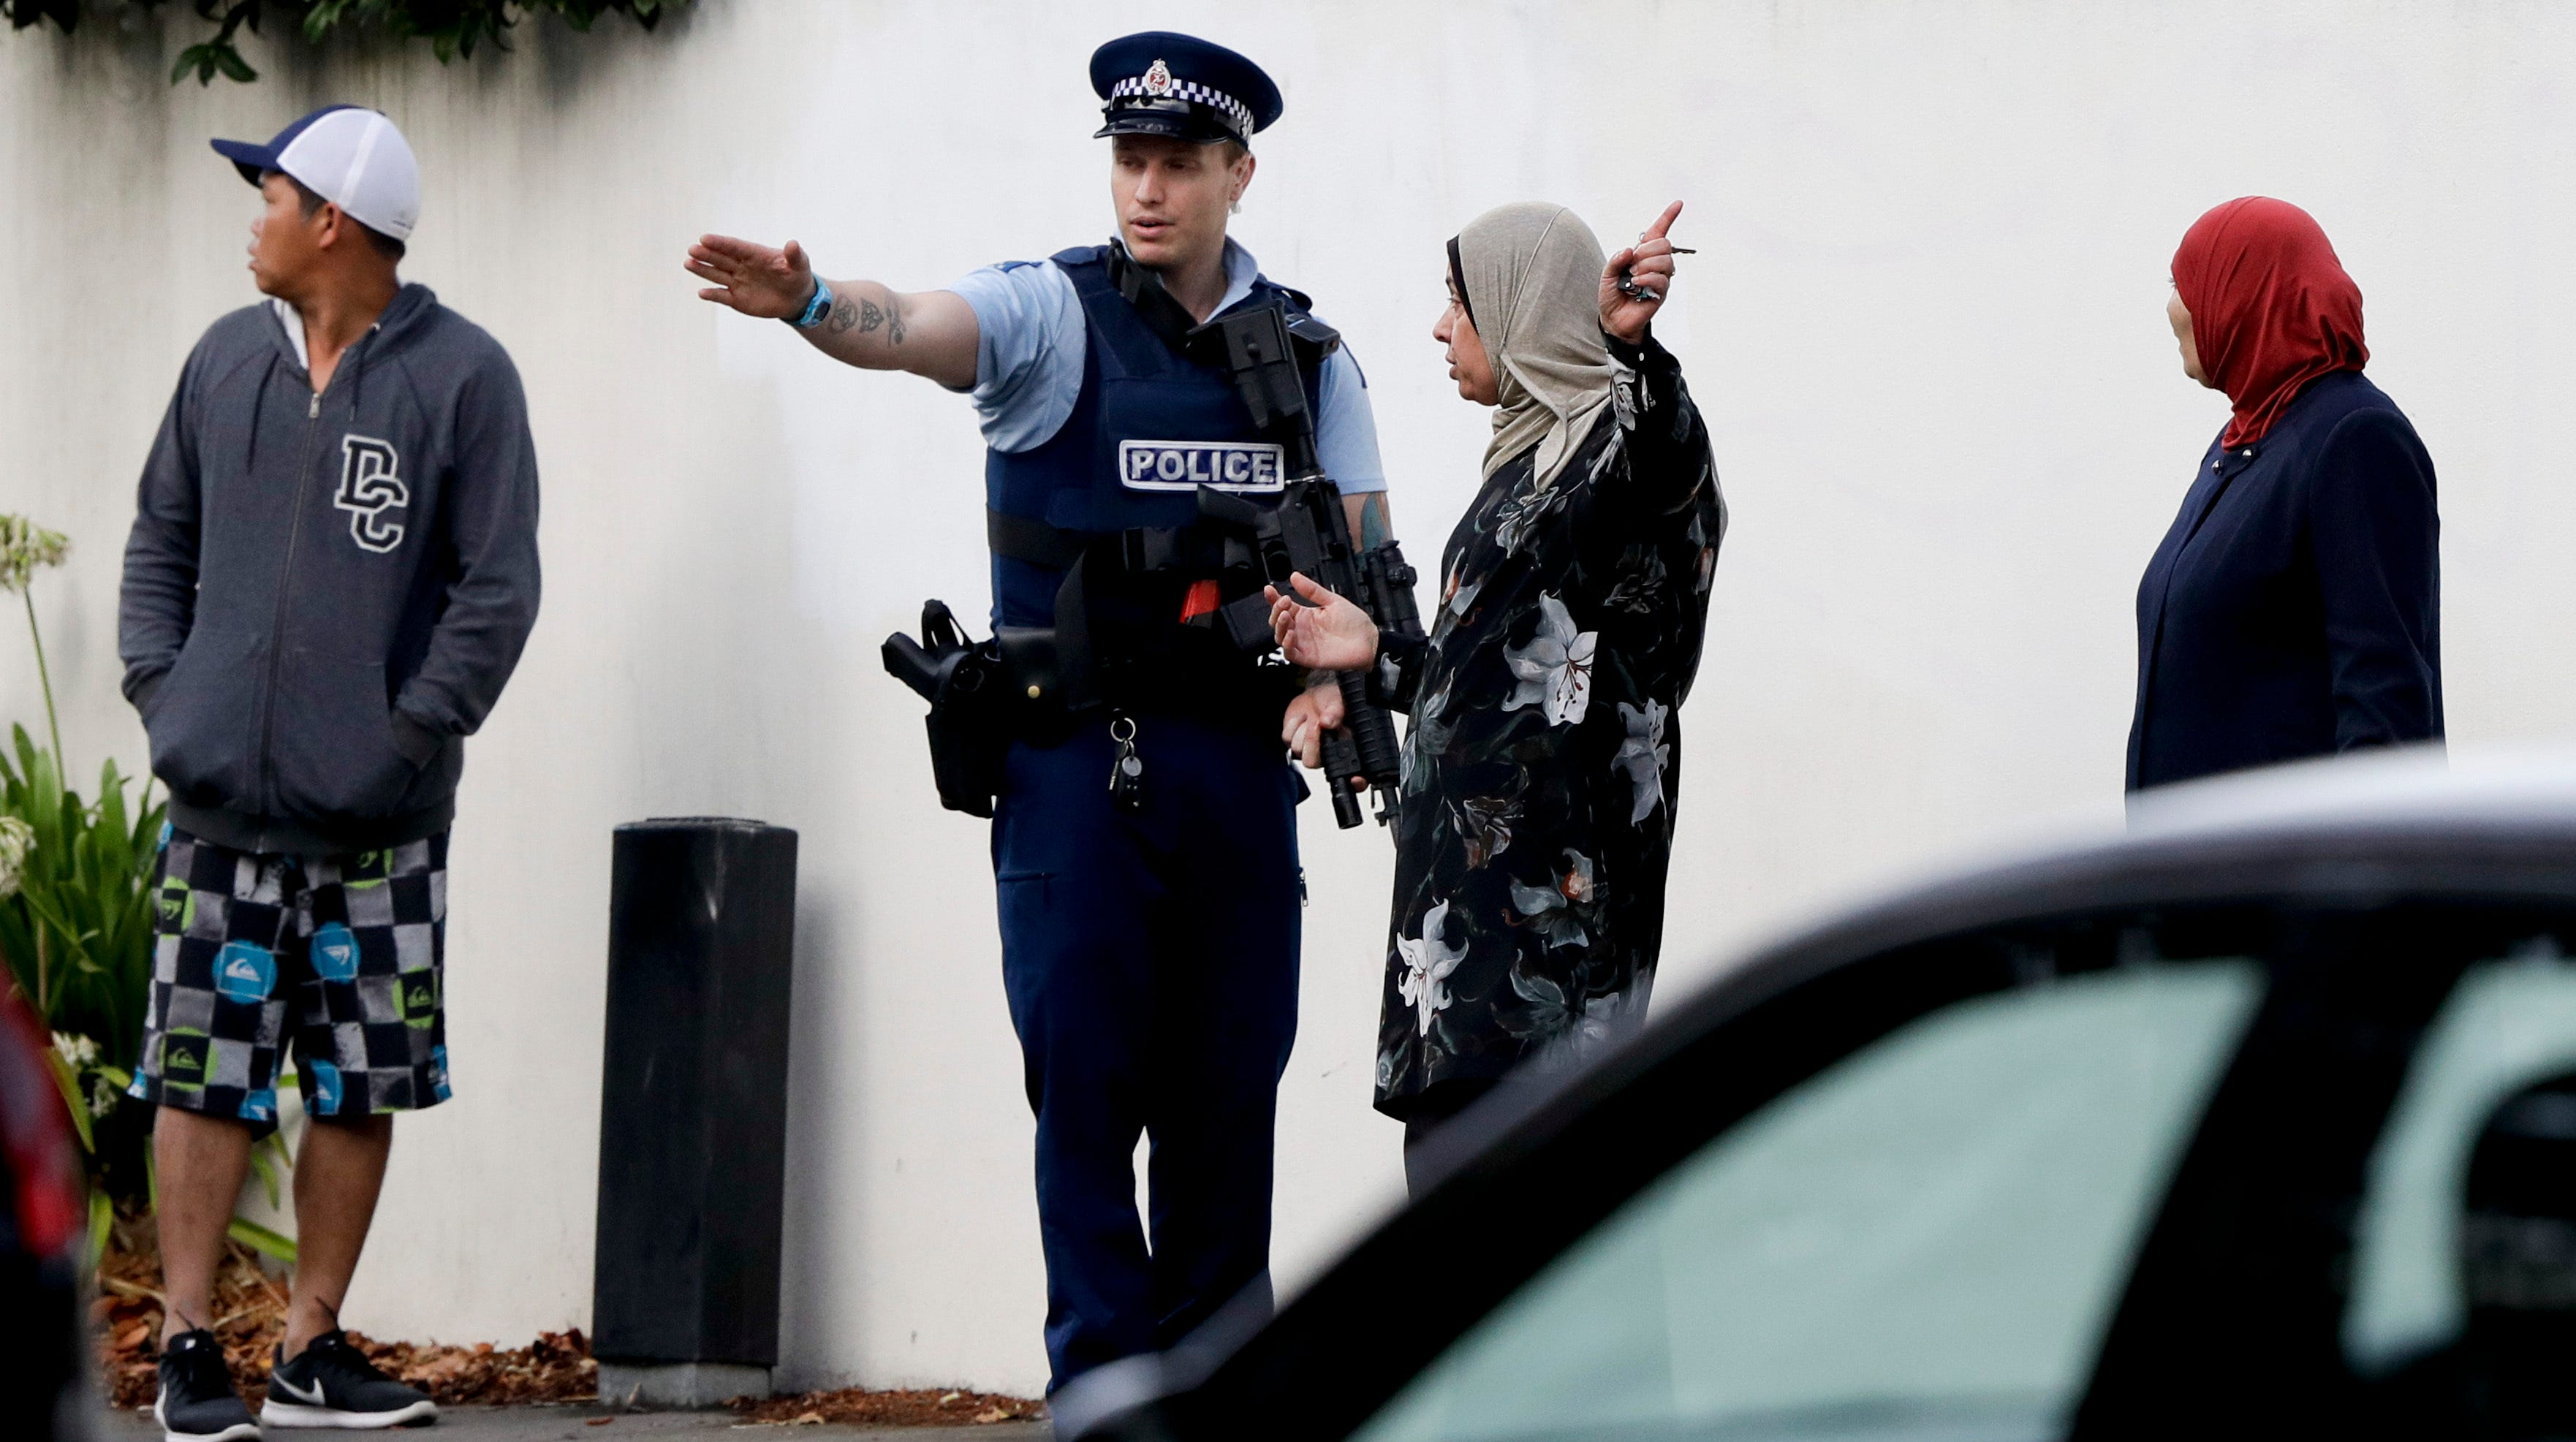 Masjid New Zealand Pinterest: The Mosque Massacres: Performance Evil In New Zealand